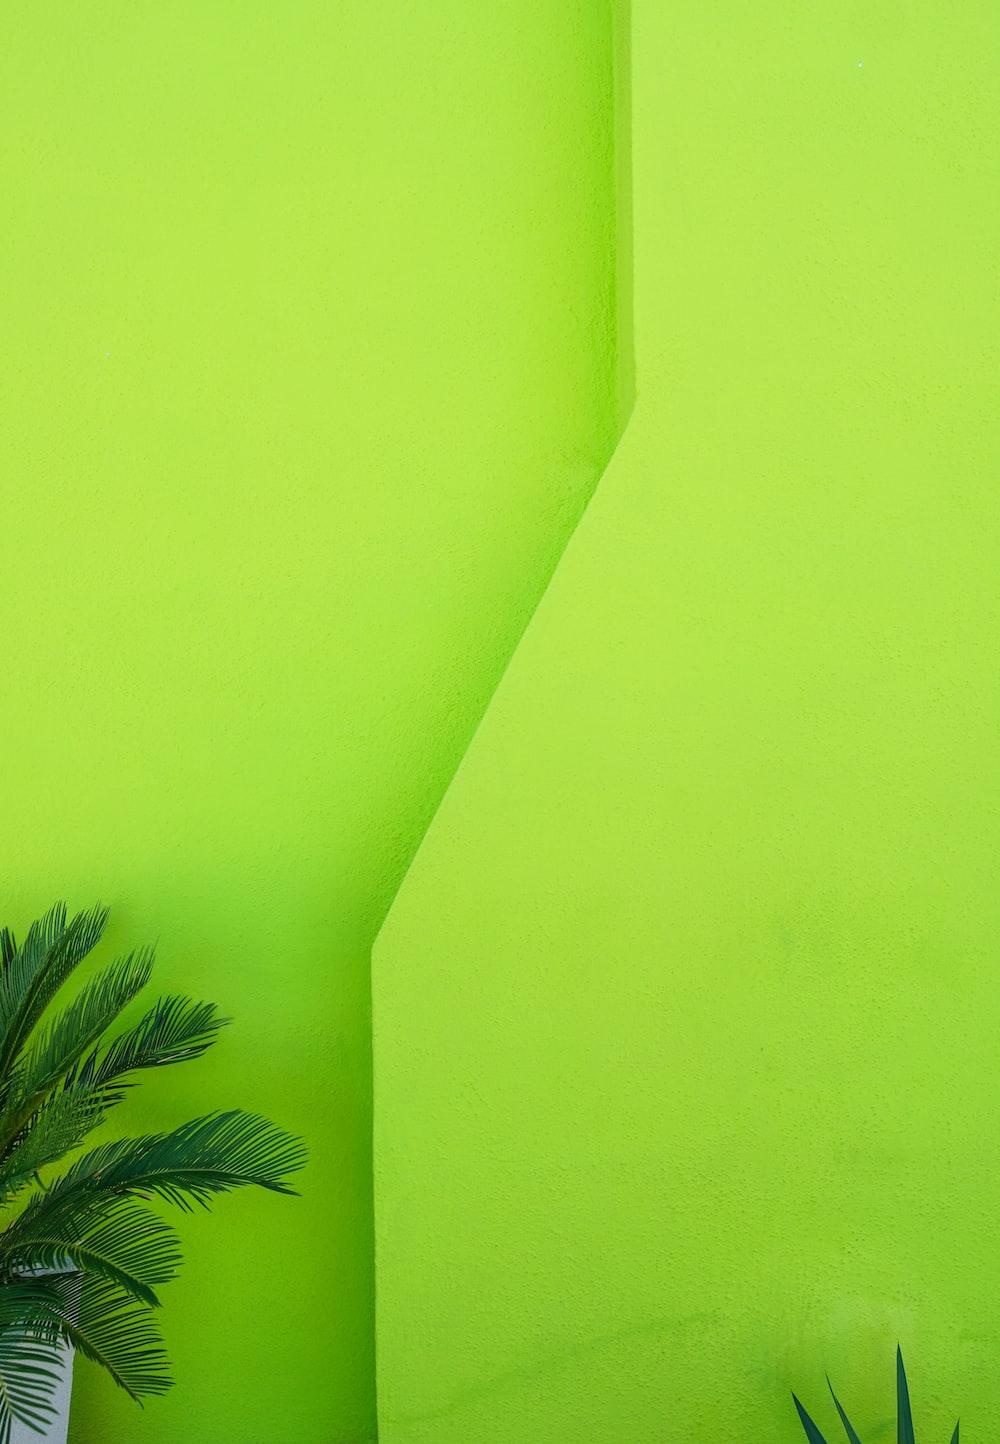 green palm tree beside green wall